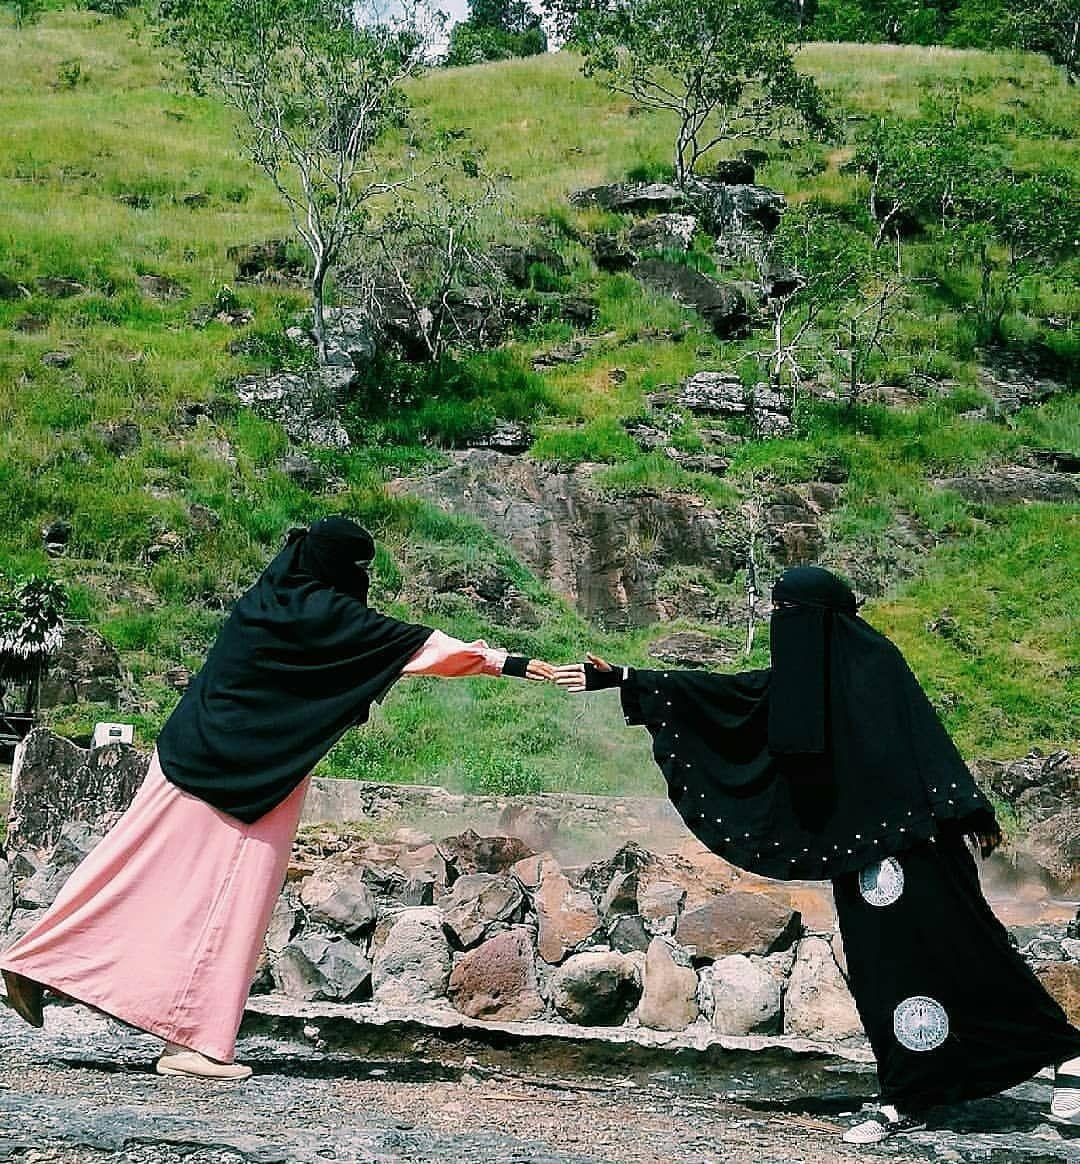 76 Gambar Ukhti Instagram Paling Hist